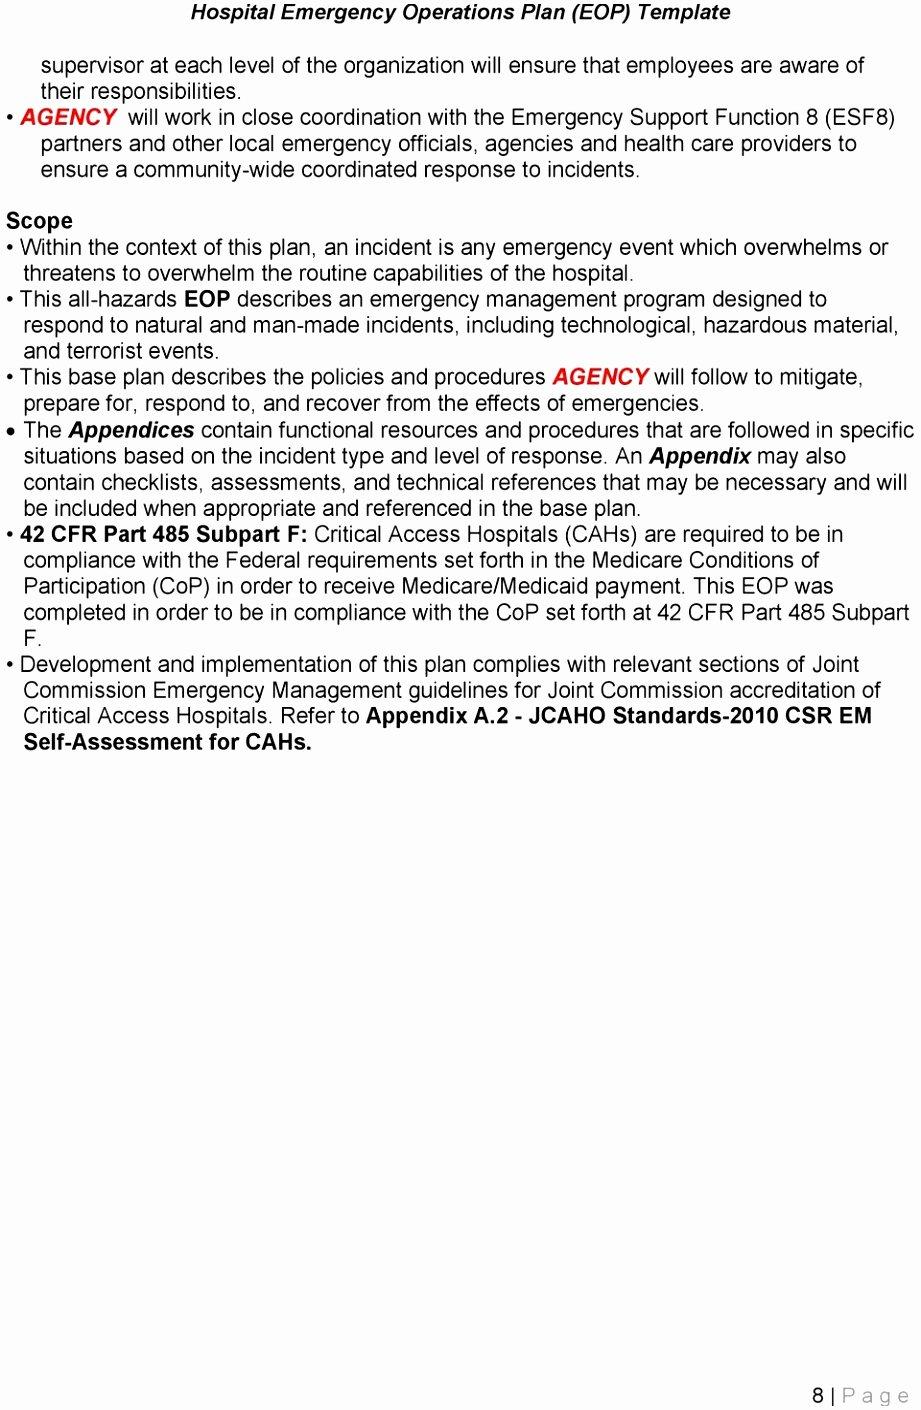 Emergency Operations Plan Template Elegant 5 Hospital Emergency Operations Plan Template Yriti